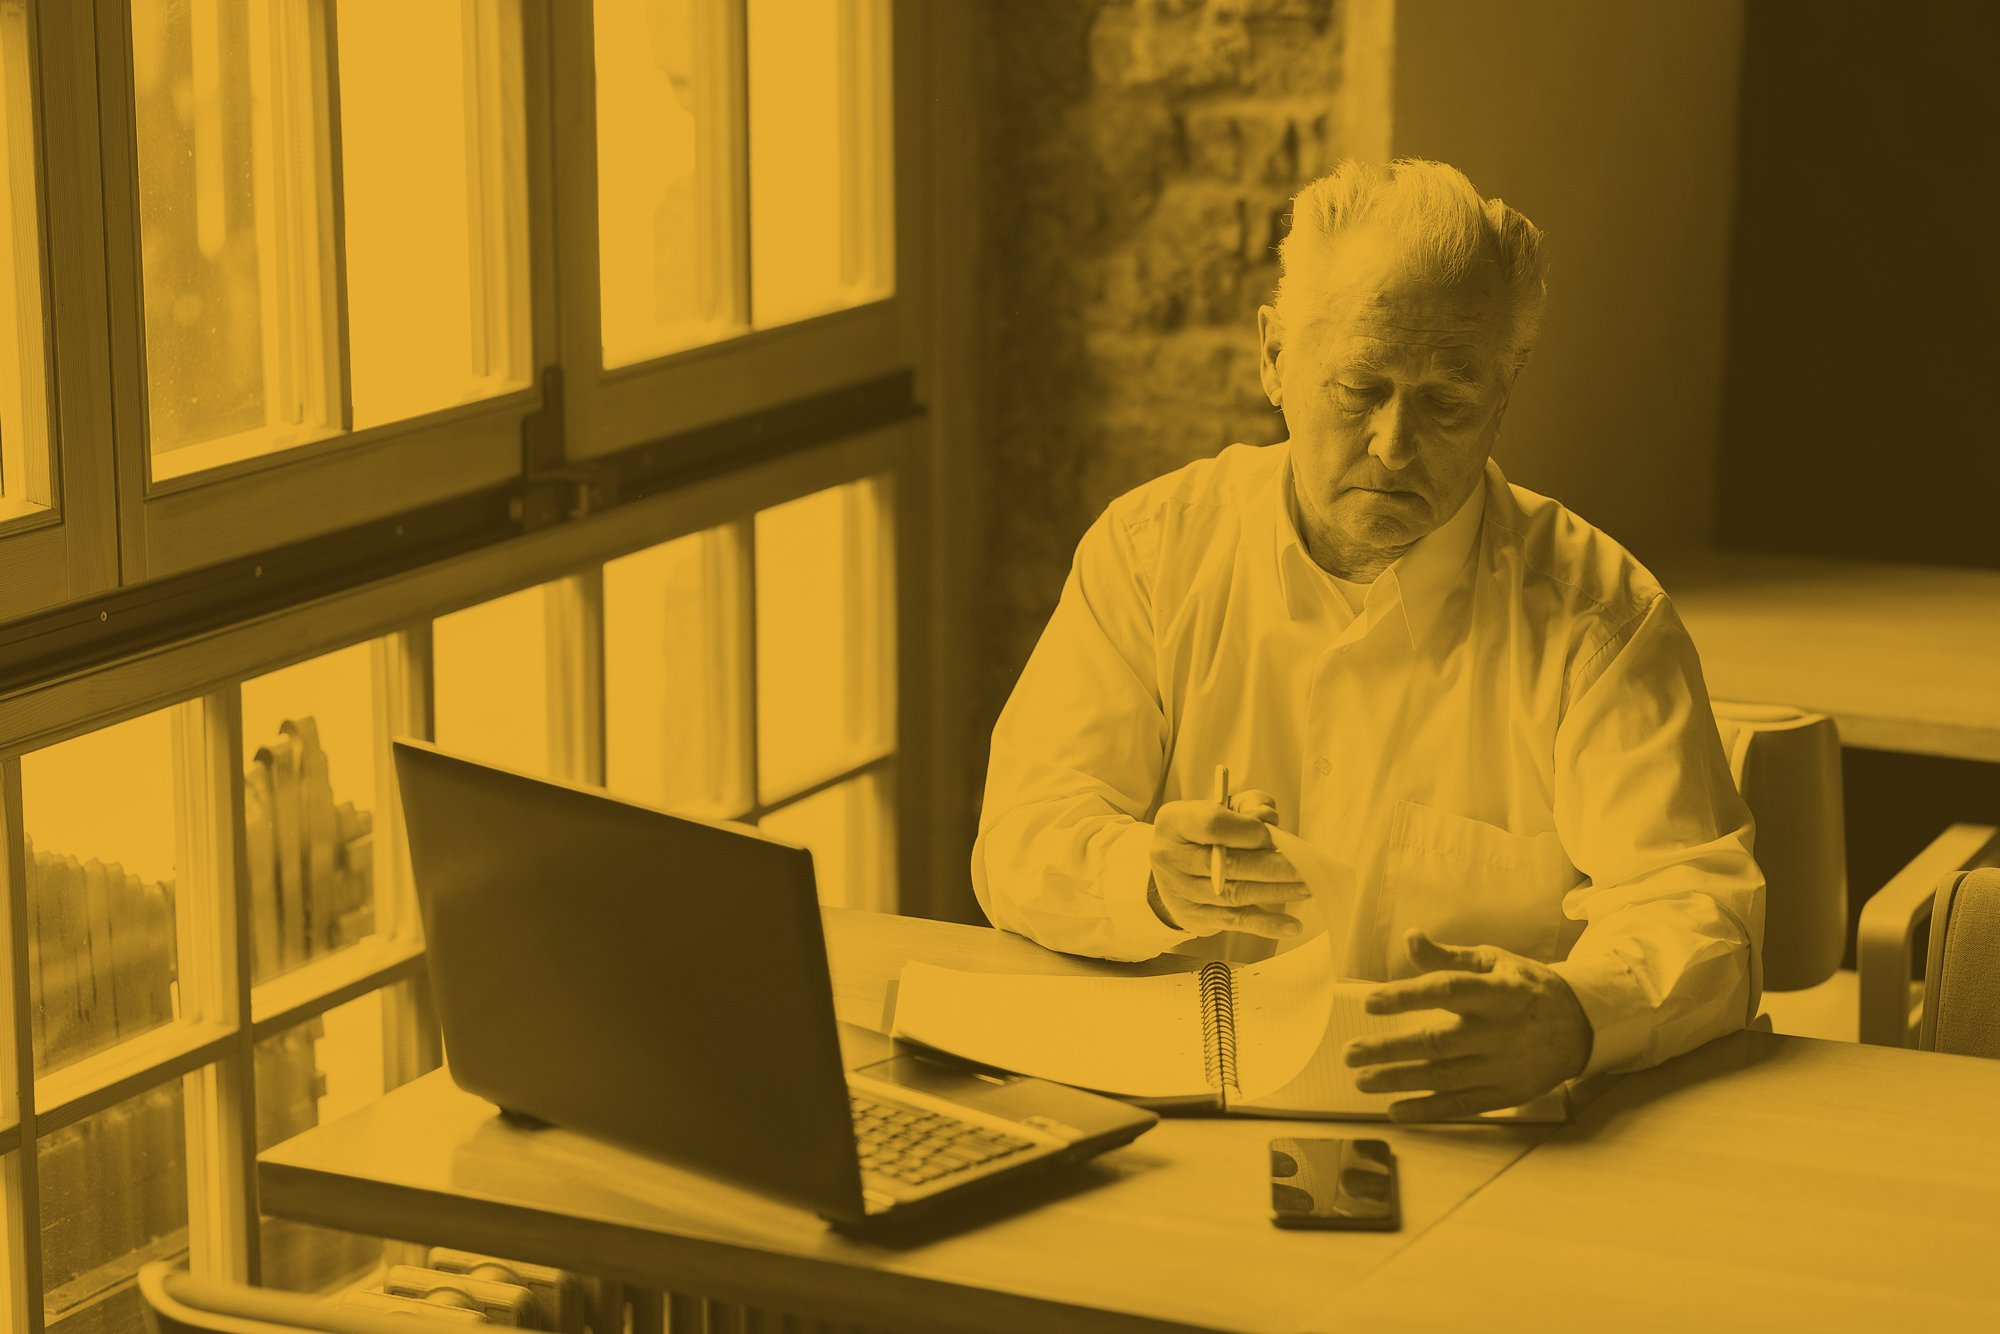 customer logging onto customer service on the computer